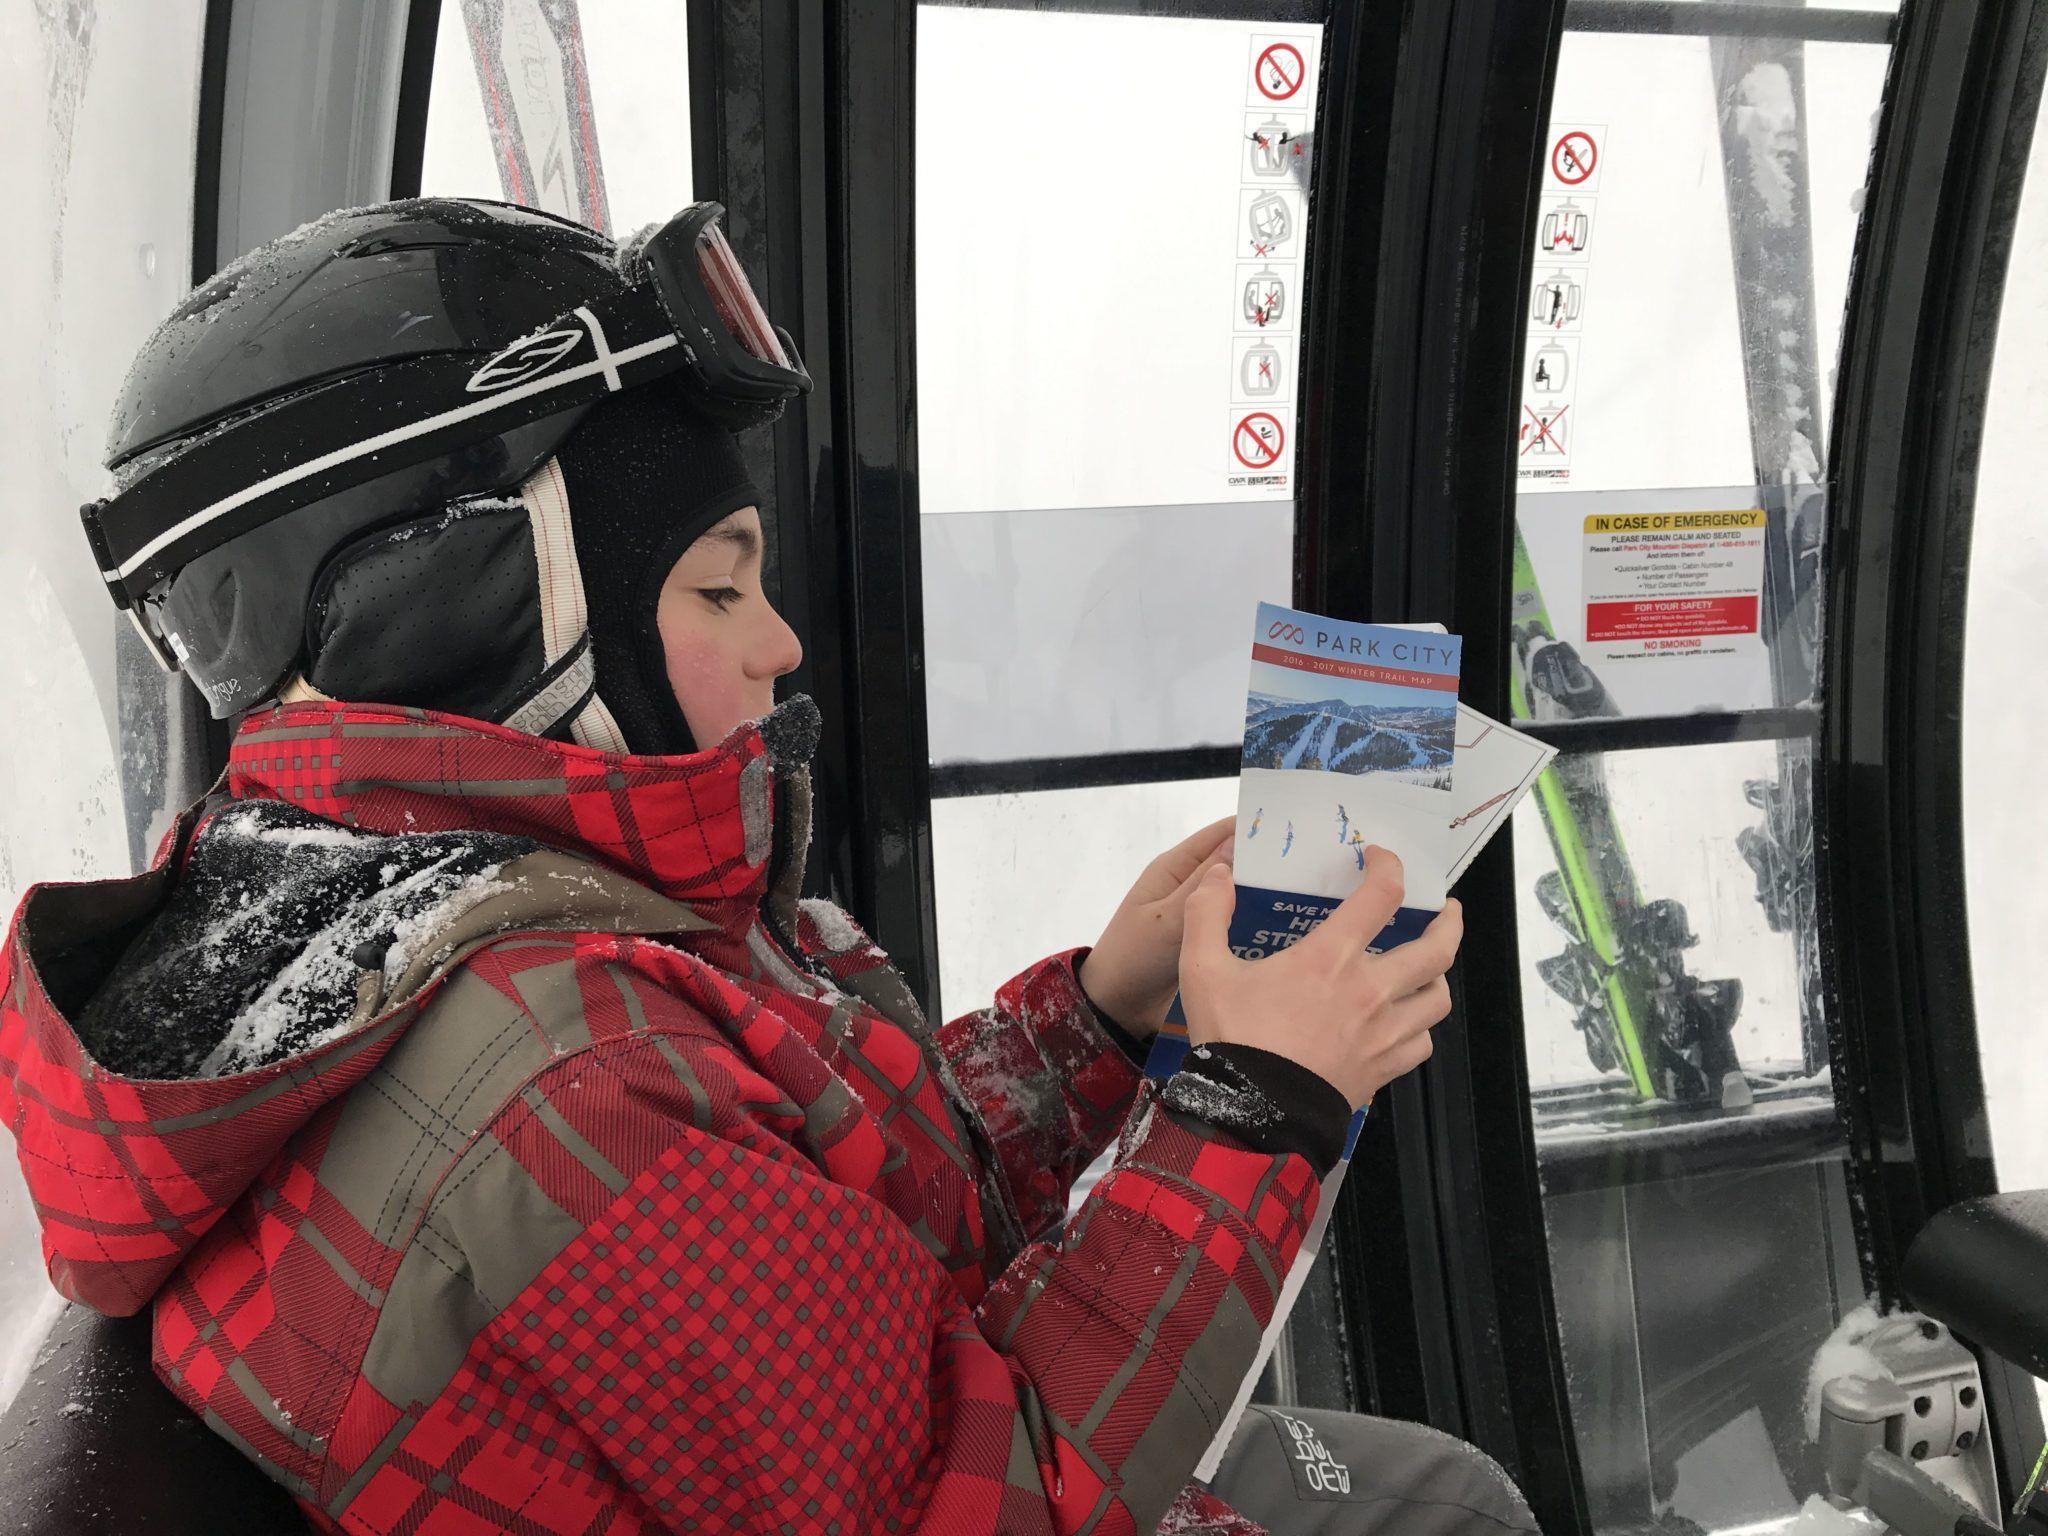 Park City Ski Resort